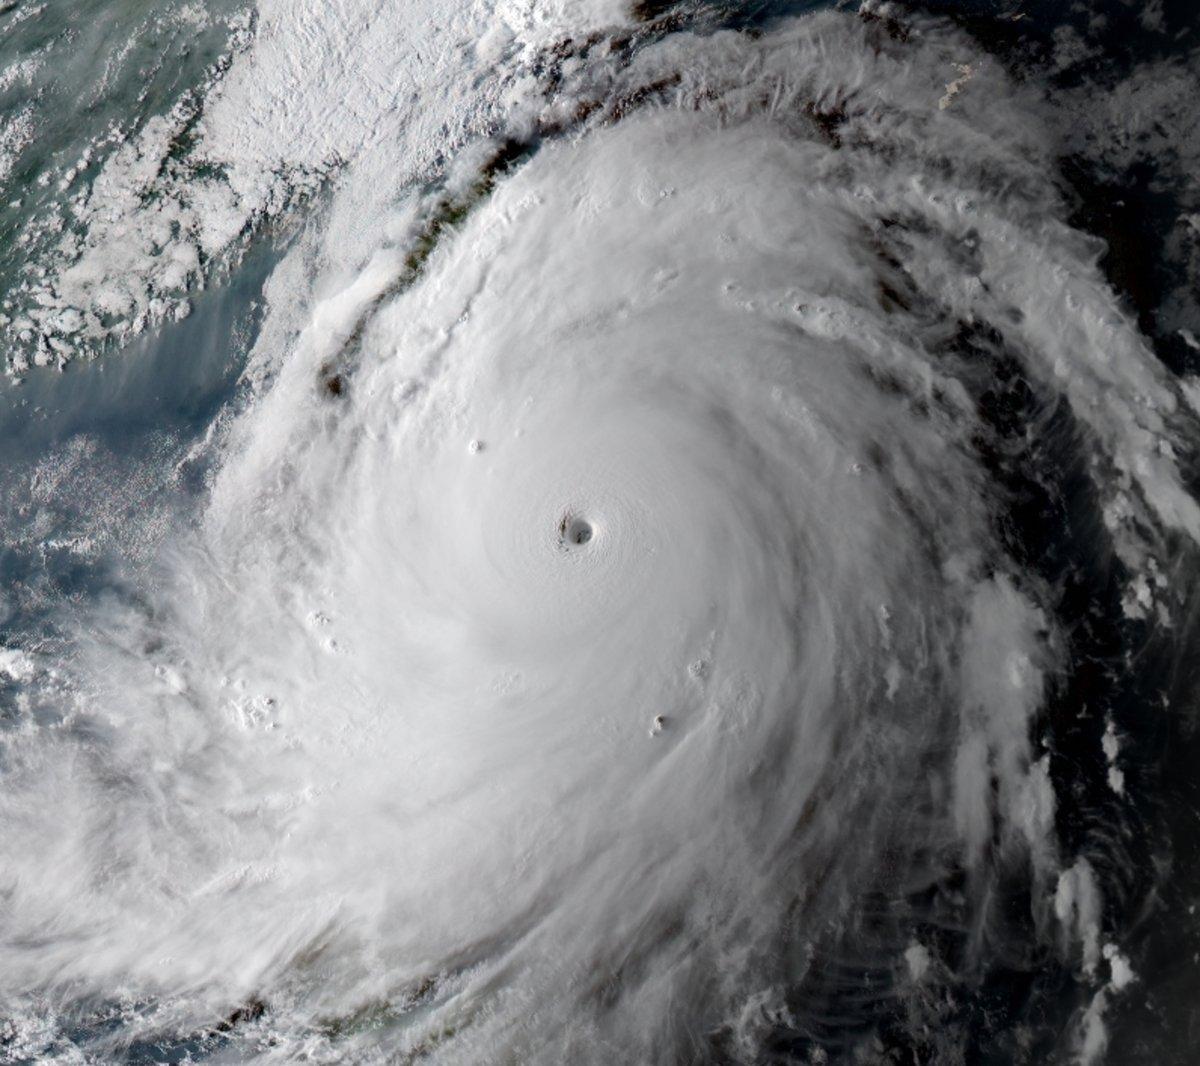 Typhon Meranti, categorie 5 - Image satellite visible Mardi mardi soir heure locale - 13/09/2016. Image credit: NOAA-NASA and RAMMB/CIRA, courtesy Jon Erdman, weather.com (@wxjerdman).